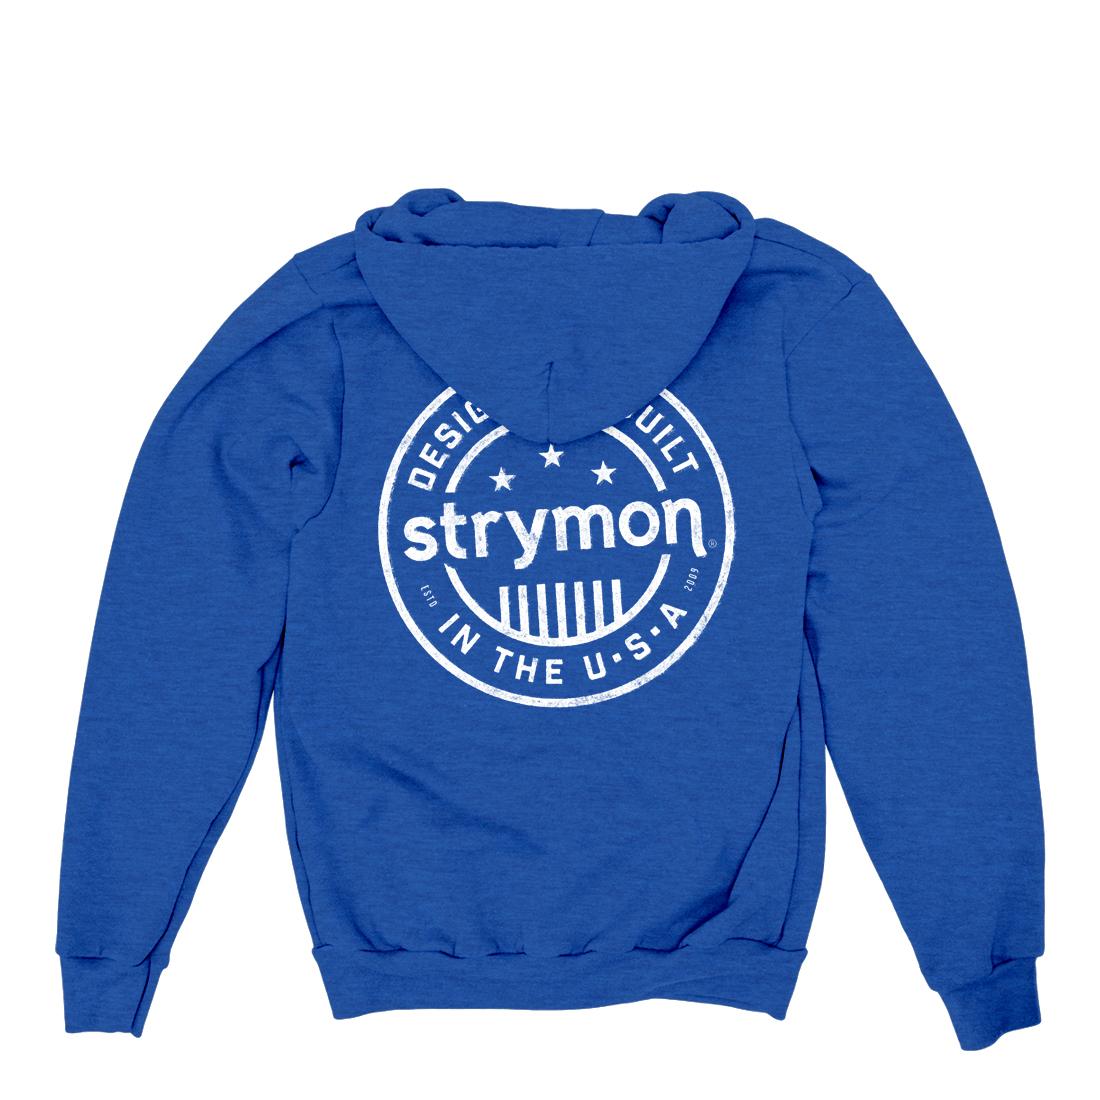 STRYMON USA [BLUE]